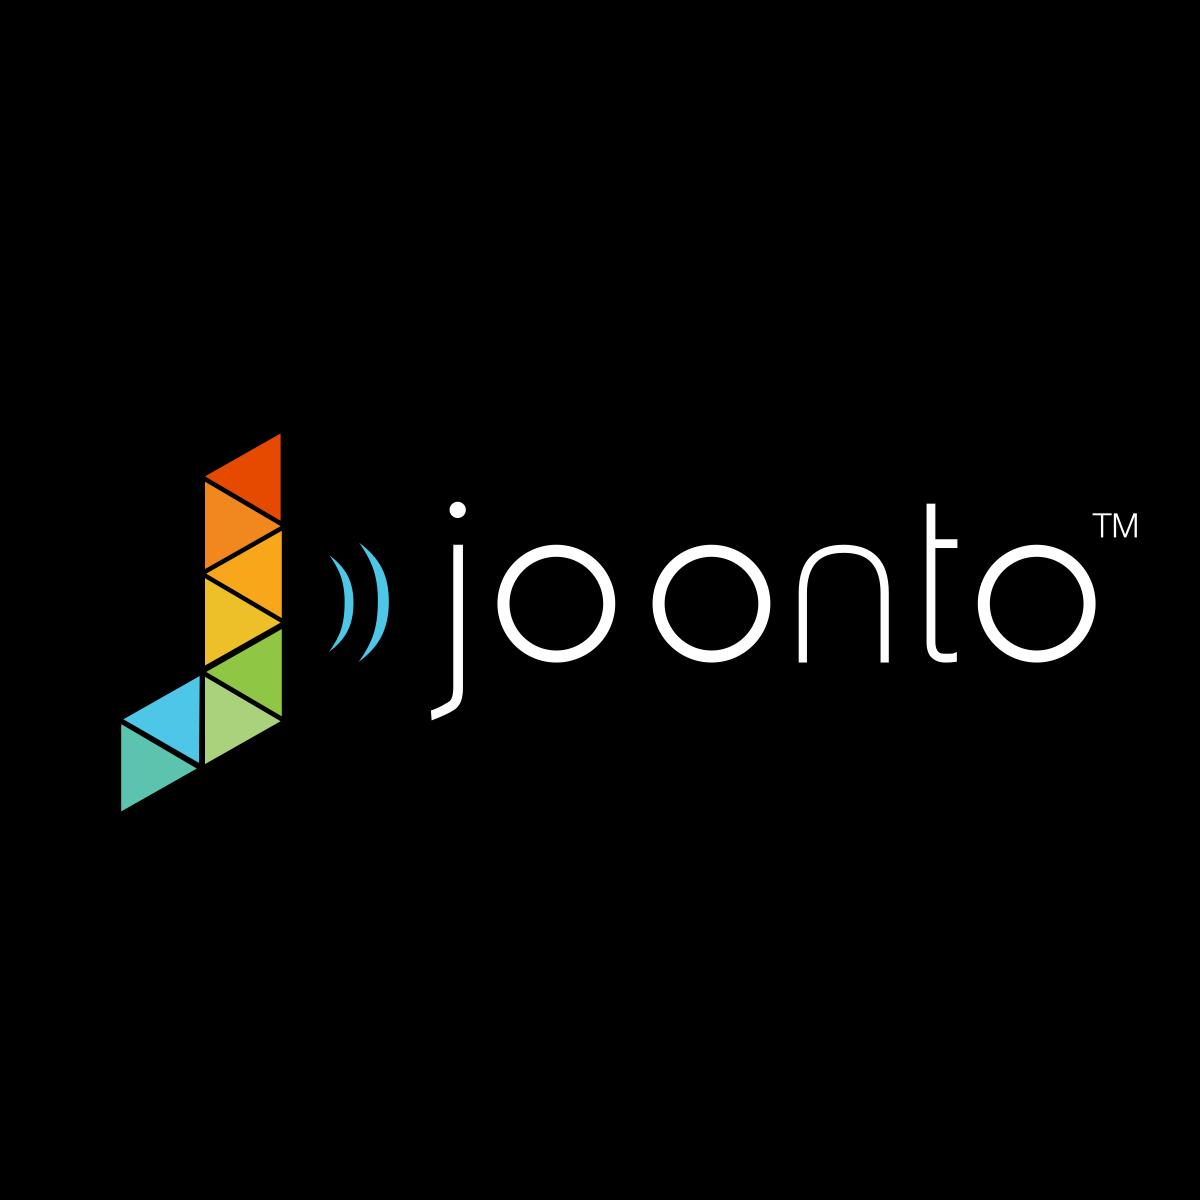 joonto_circle_sticker_black.png